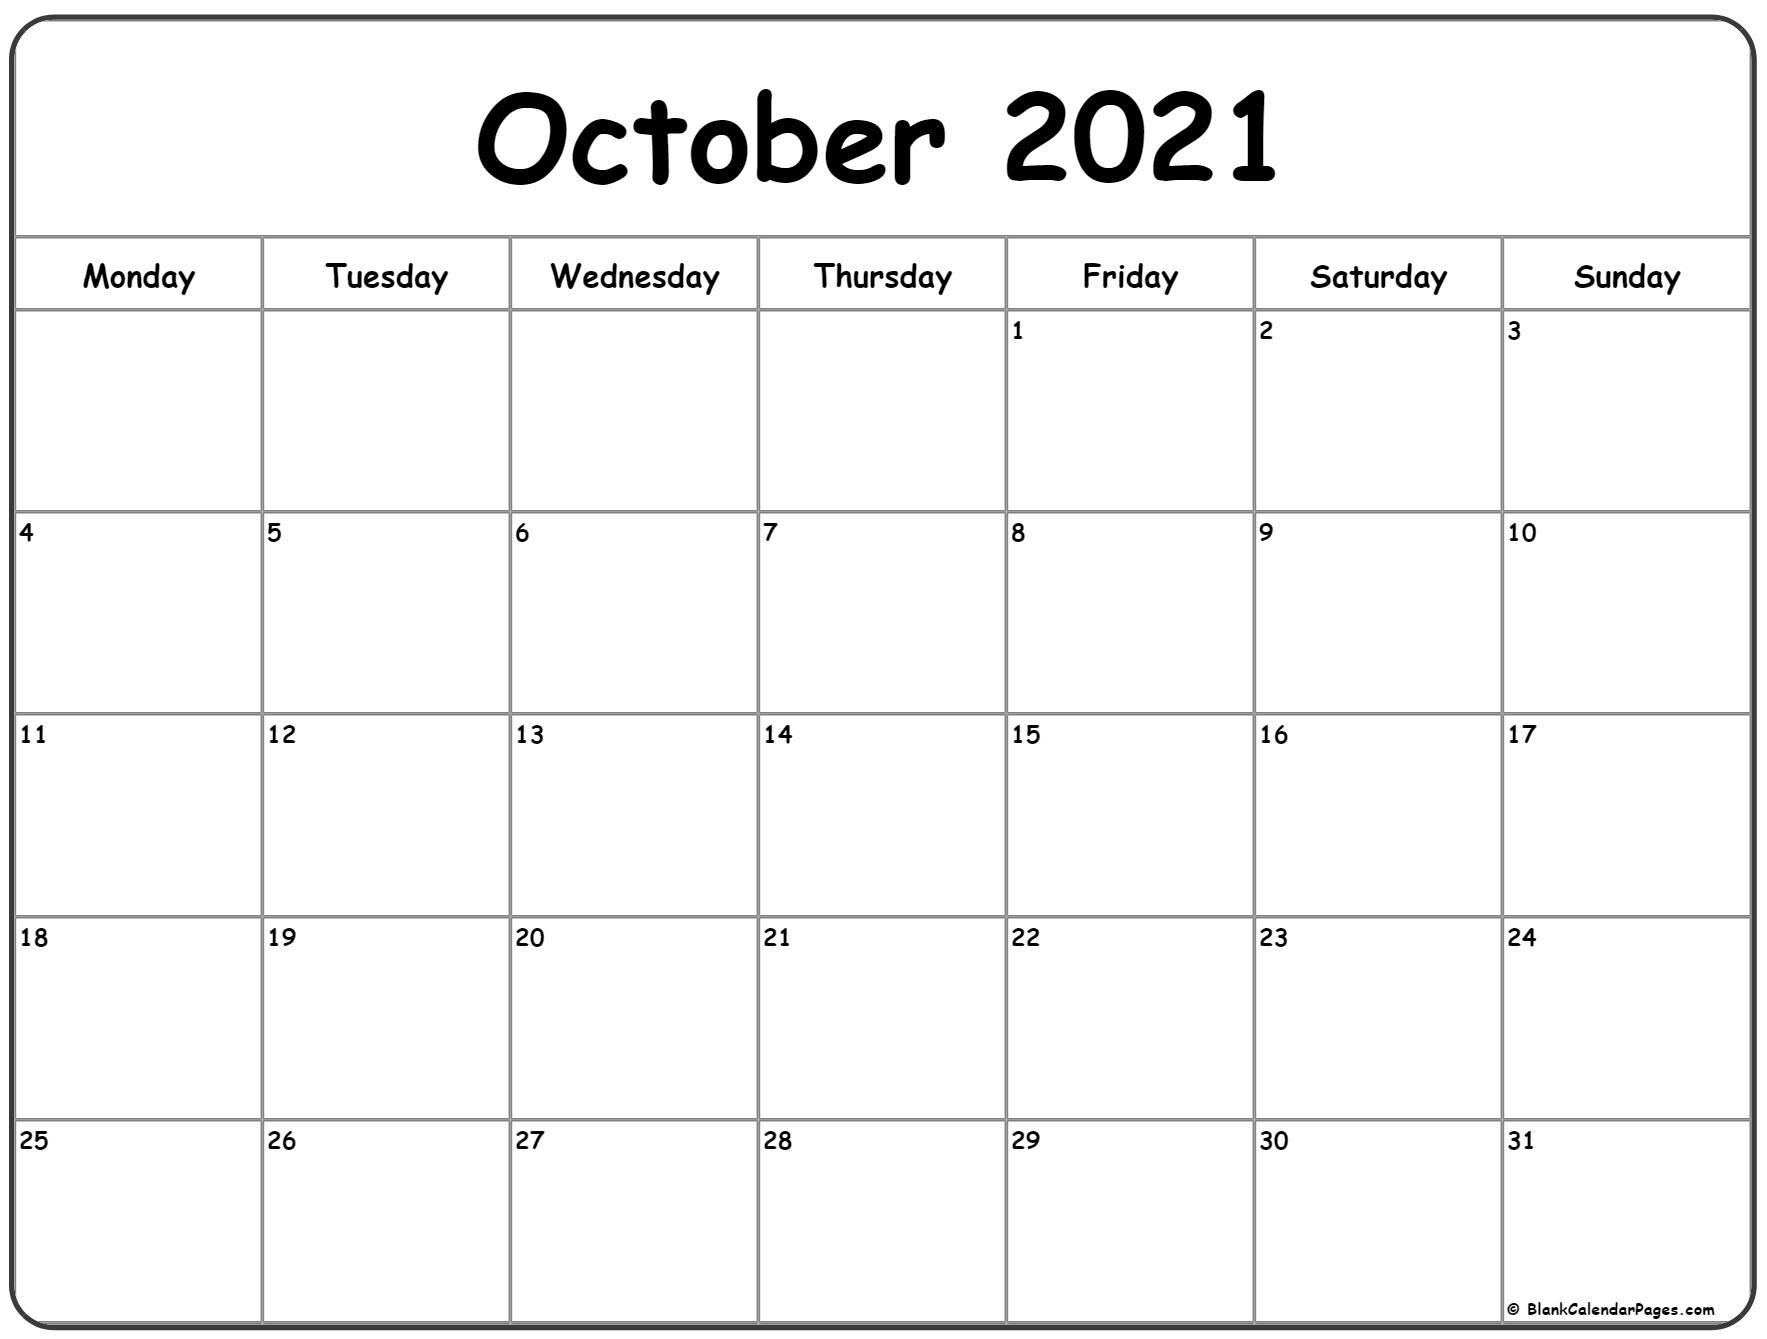 October 2021 Monday Calendar   Monday To Sunday